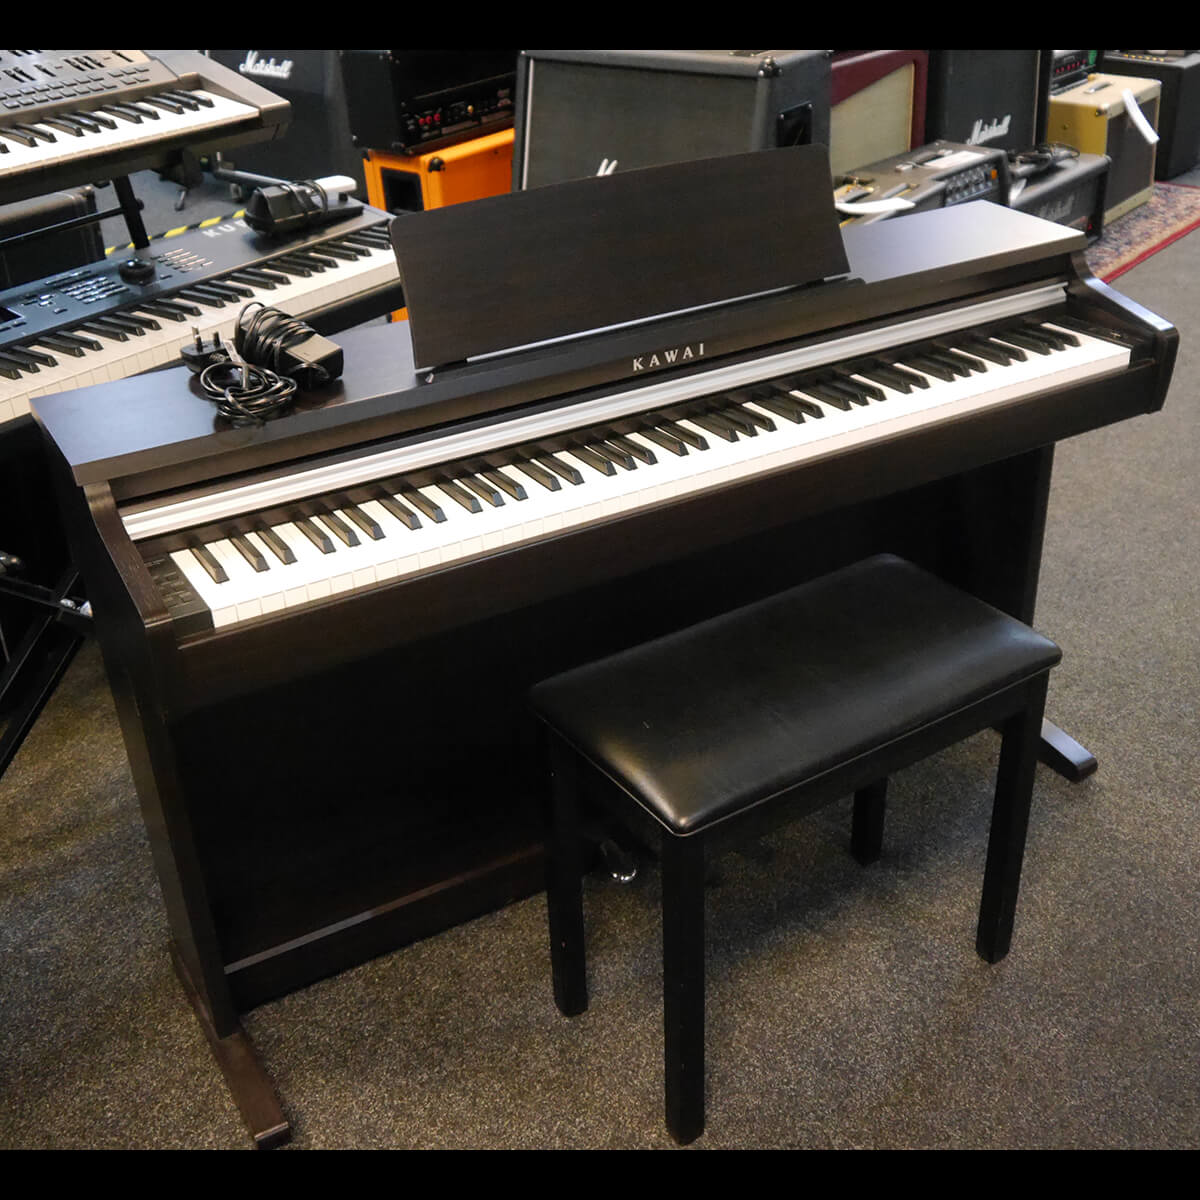 Kawai KDP110 88-Key Piano & PSU - 2nd Hand **COLLECTION ONLY**